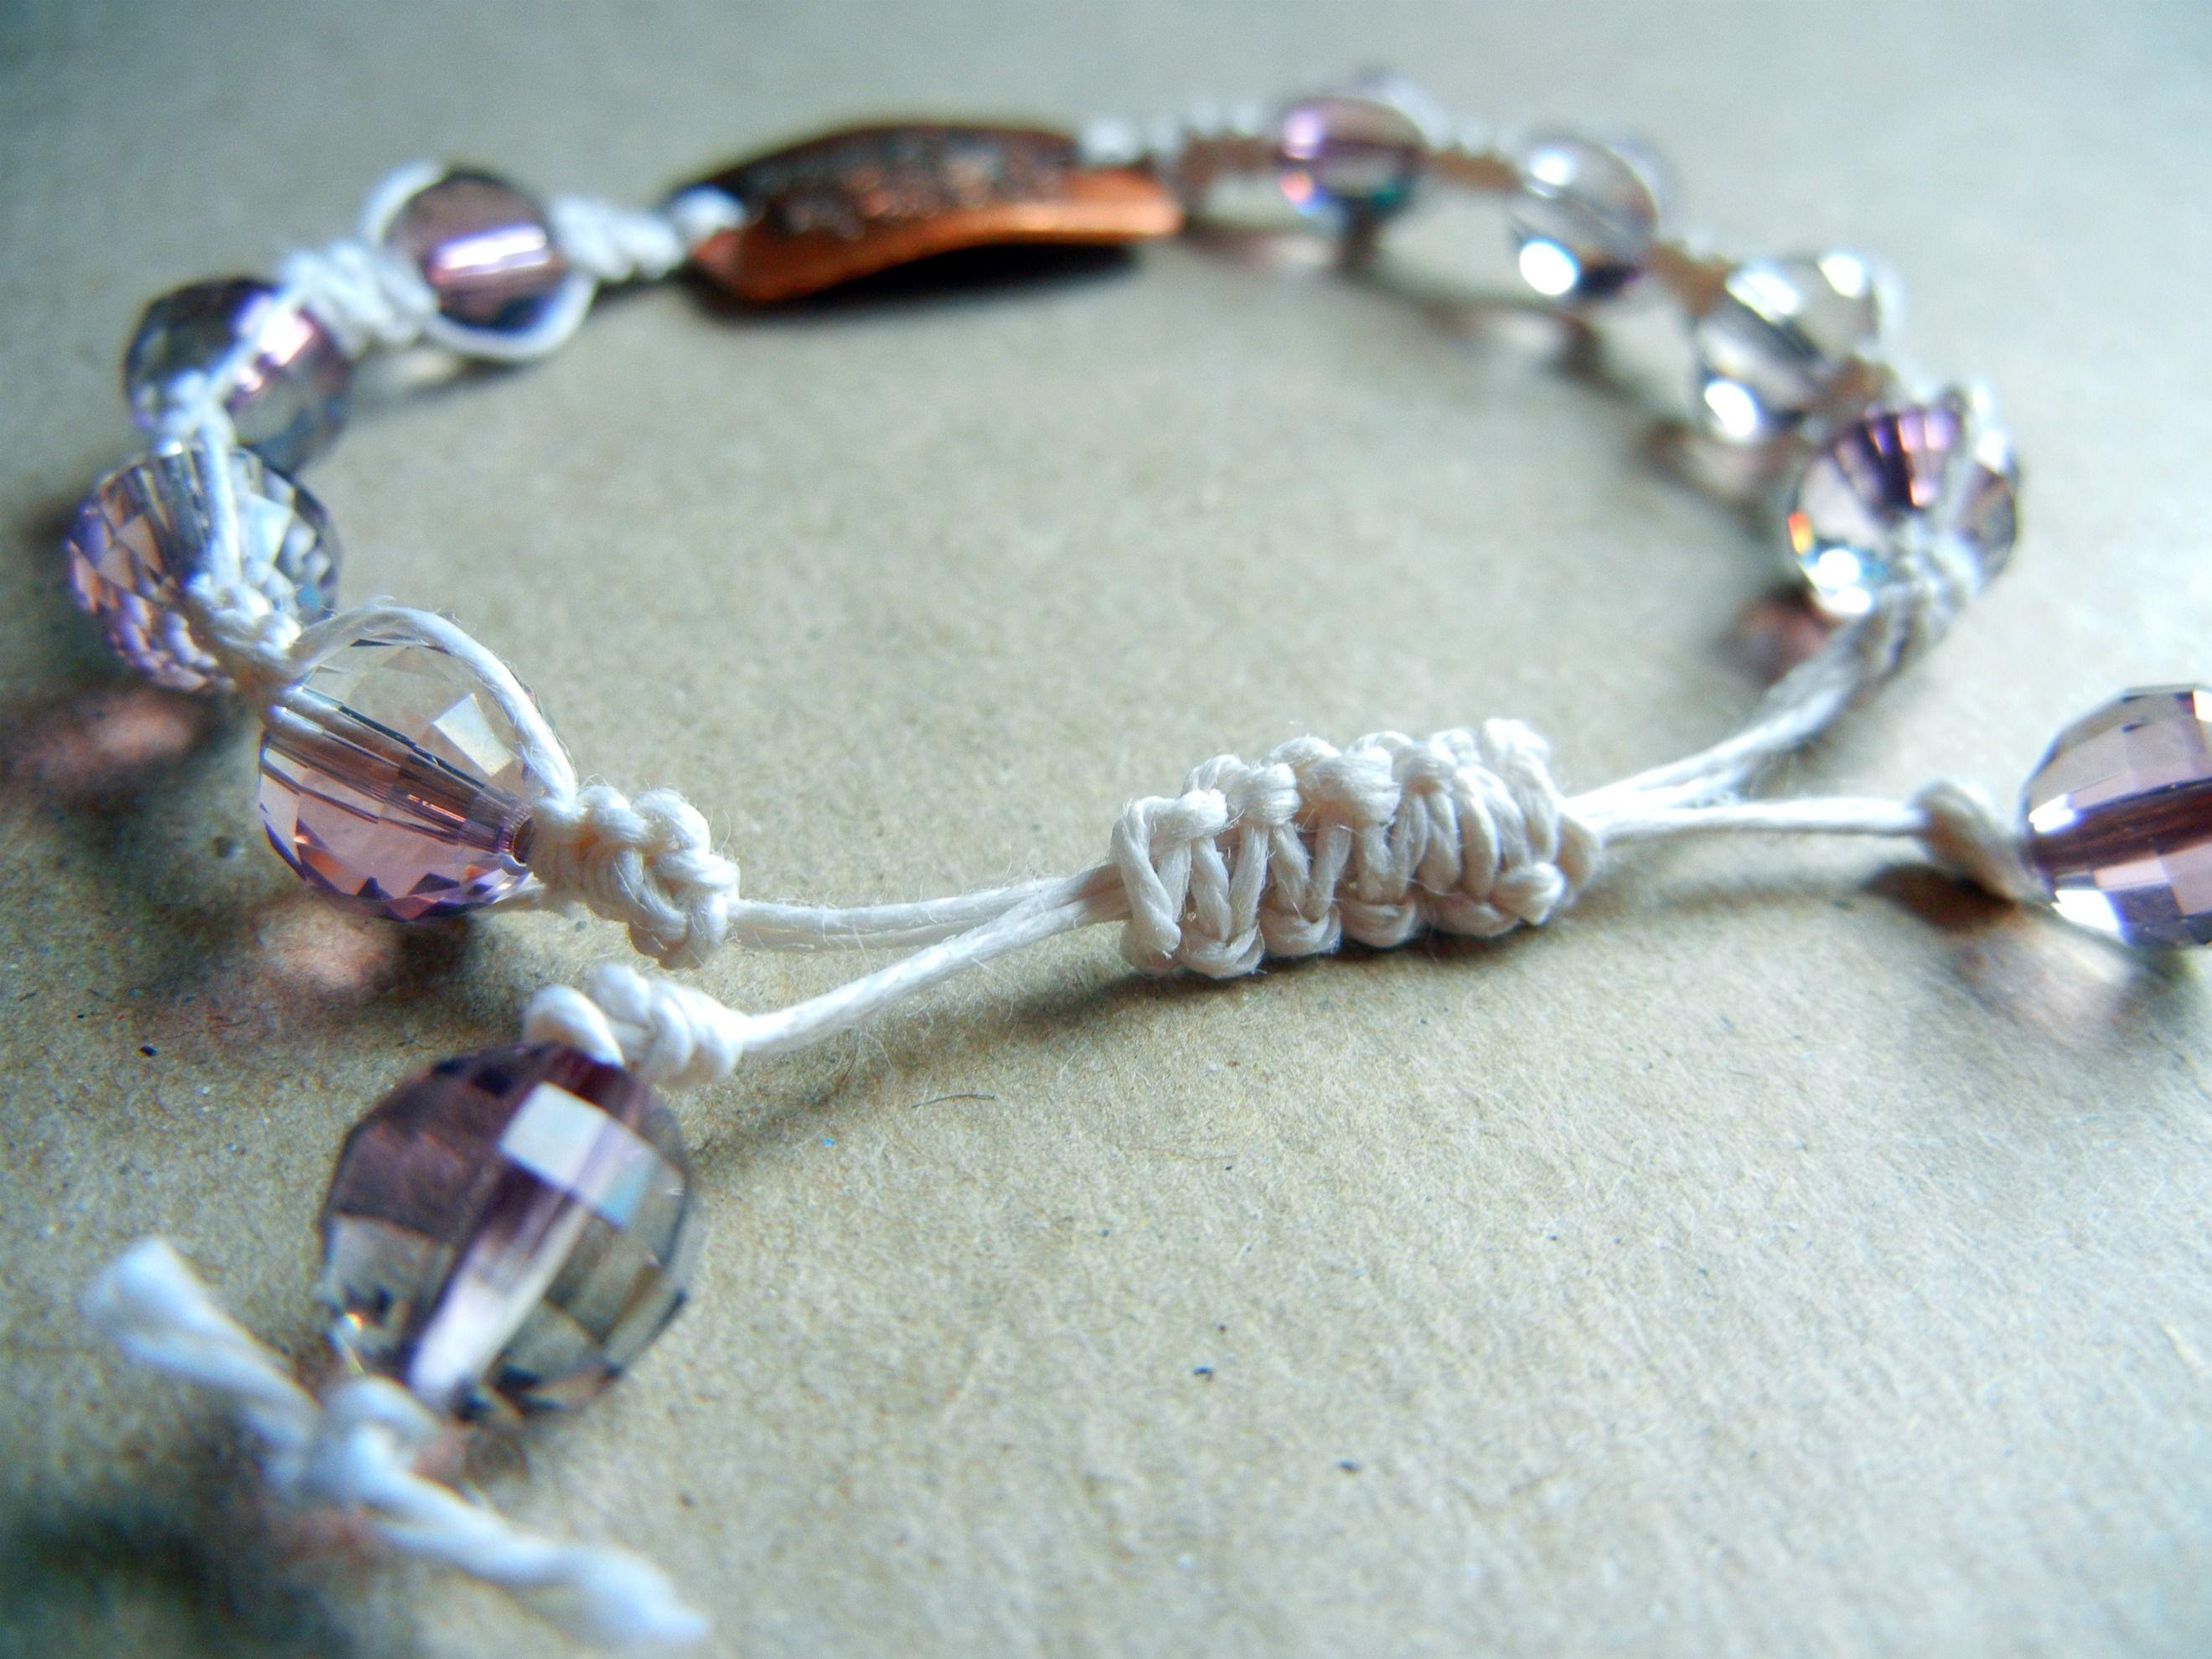 Diy Shamballa Style Macrame Bracelet Tutorial With Sliding Knot Closure